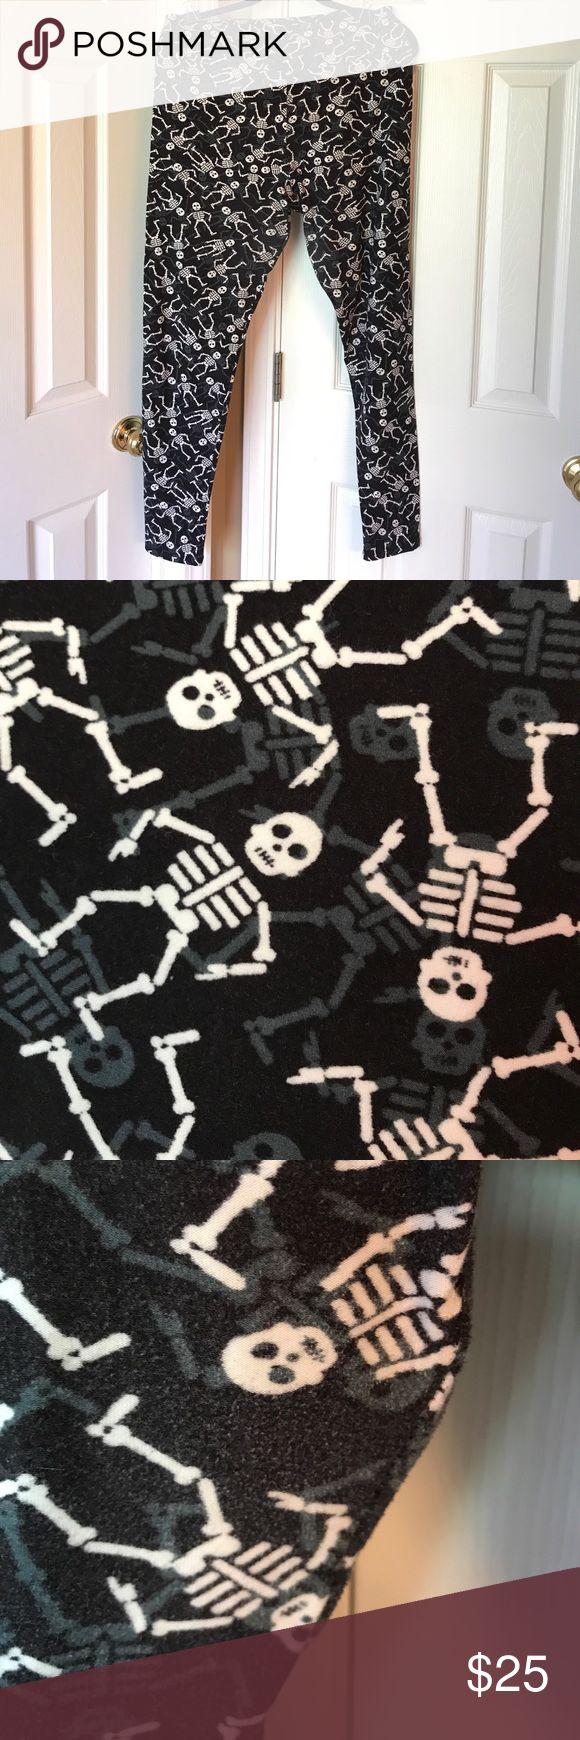 TC Halloween leggings TC Halloween LuLaRoe leggings. Black base with white and dark grey skeletons. A little worn on inner thigh. Pictured. Worn/washed once. LuLaRoe Pants Leggings